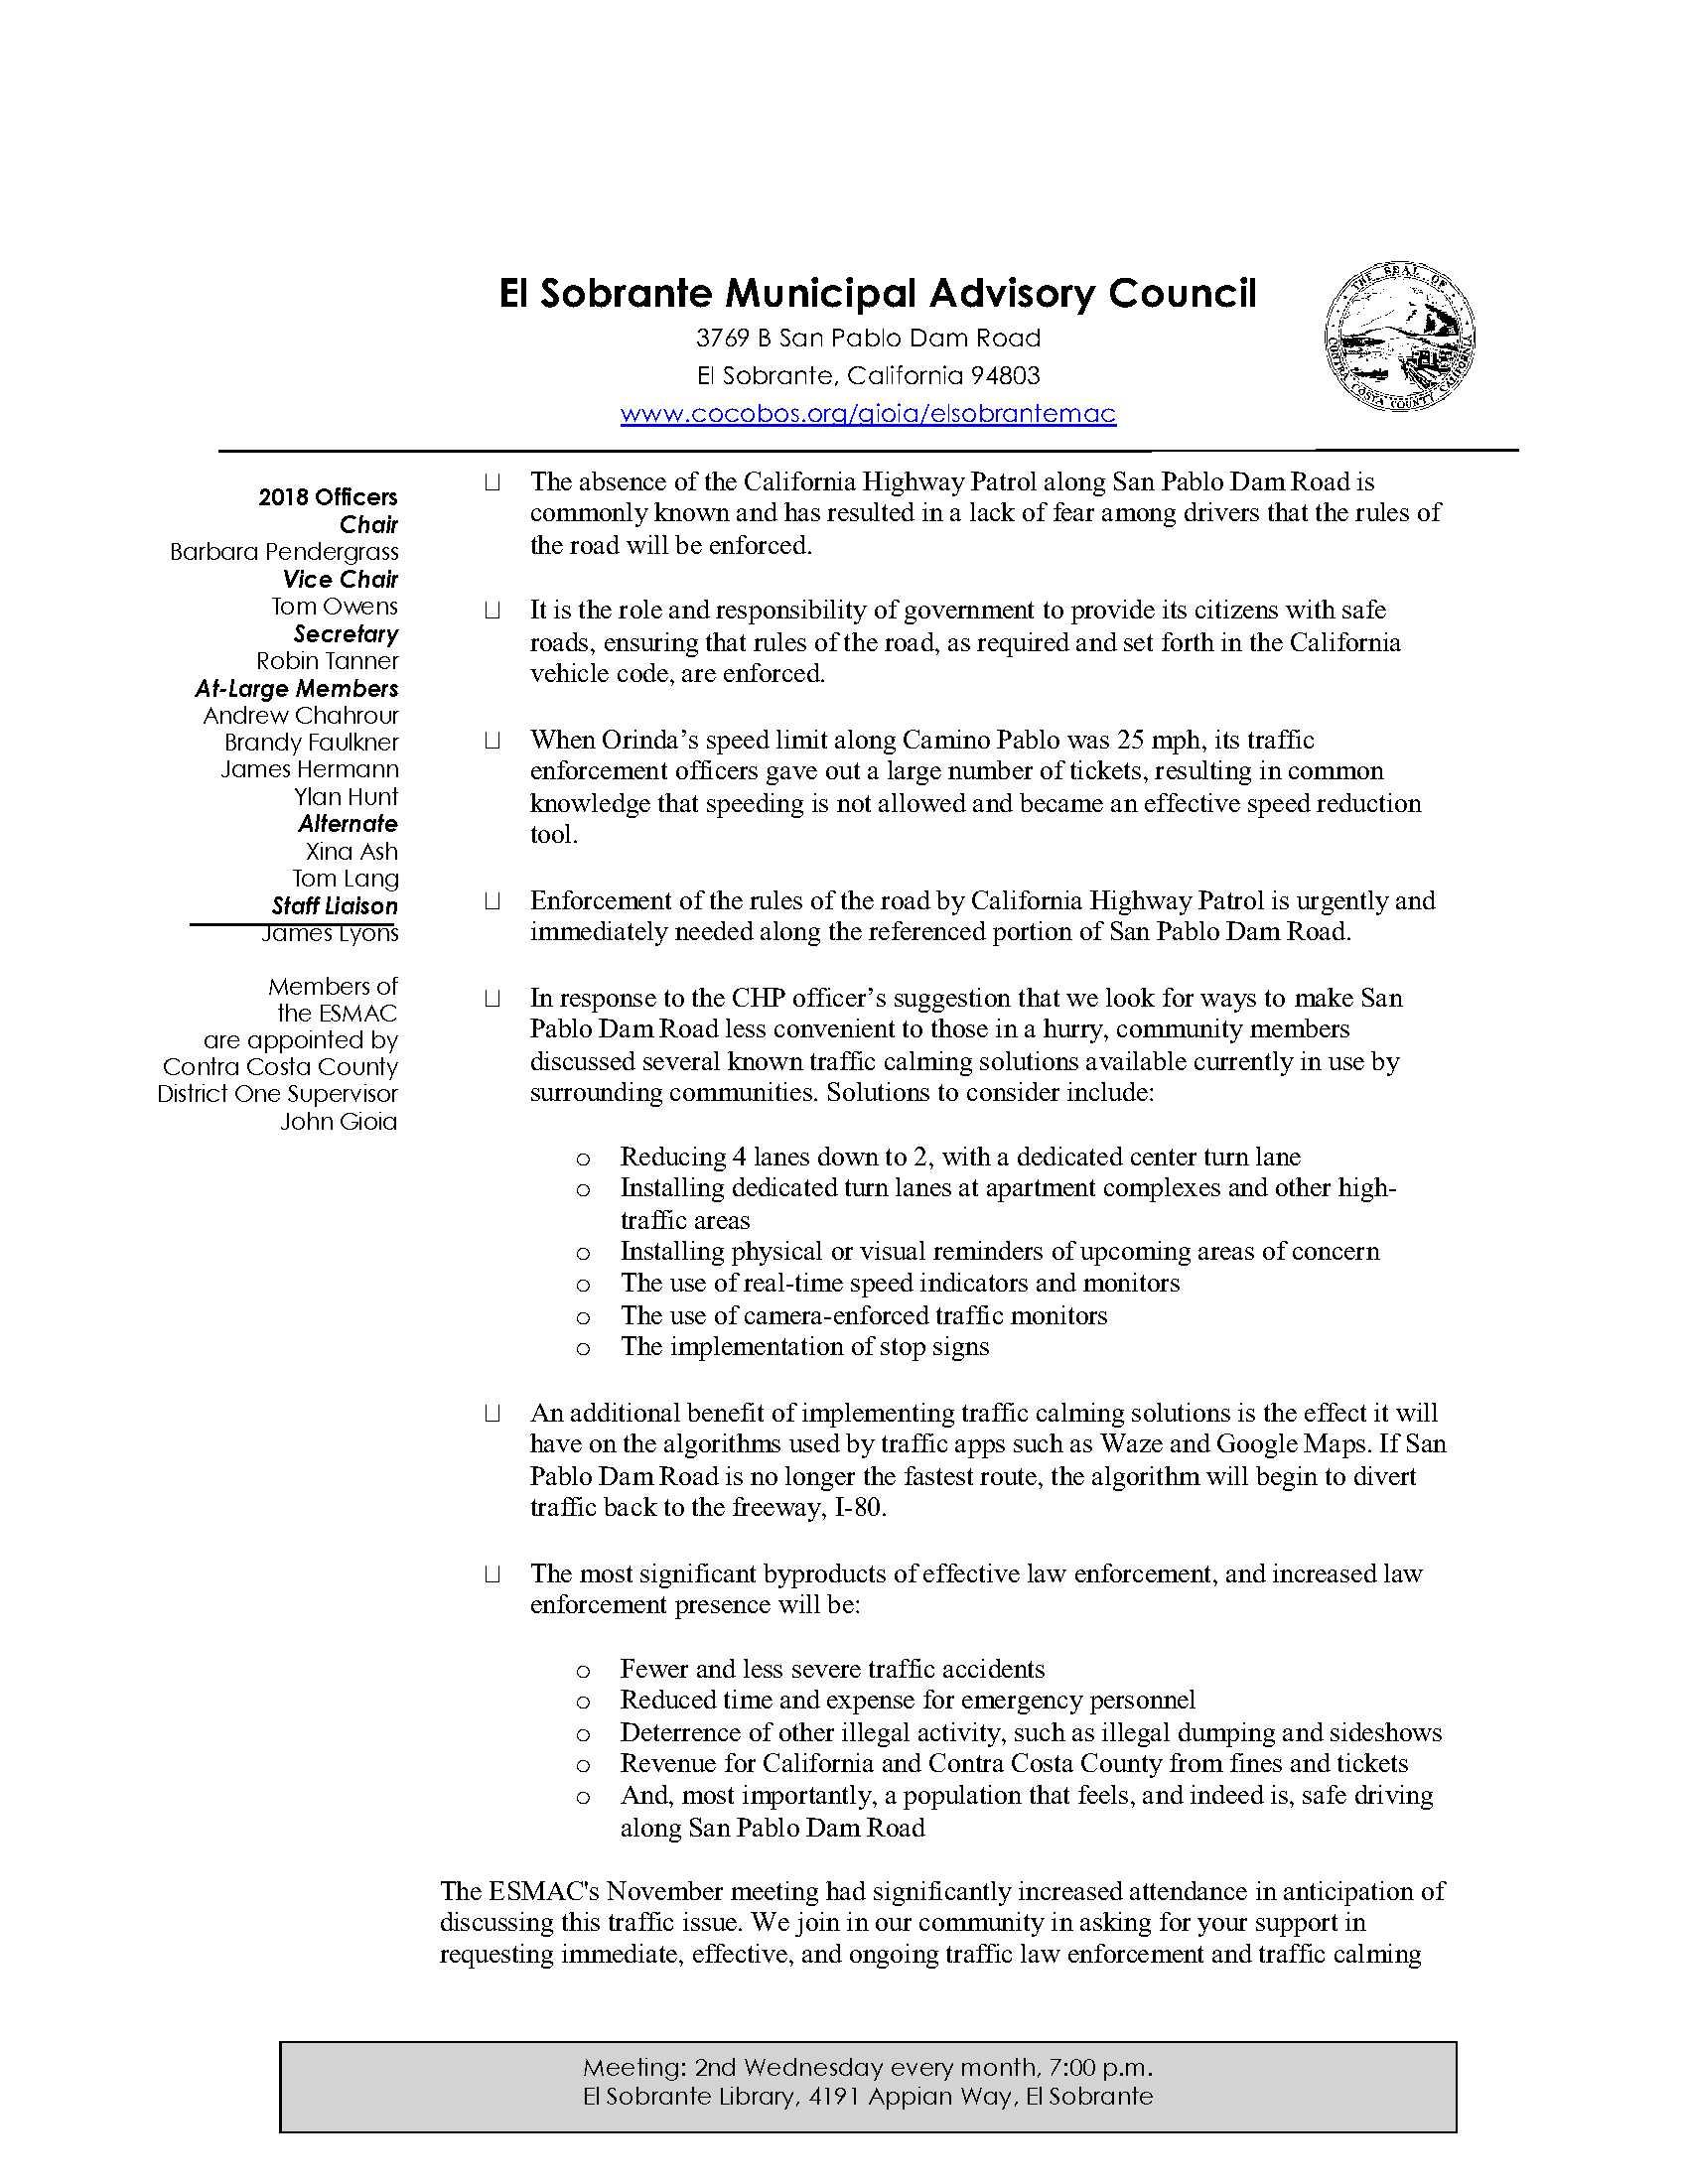 ESMAC Agenda 12.13.2018 (51 Pages)_20.jpg